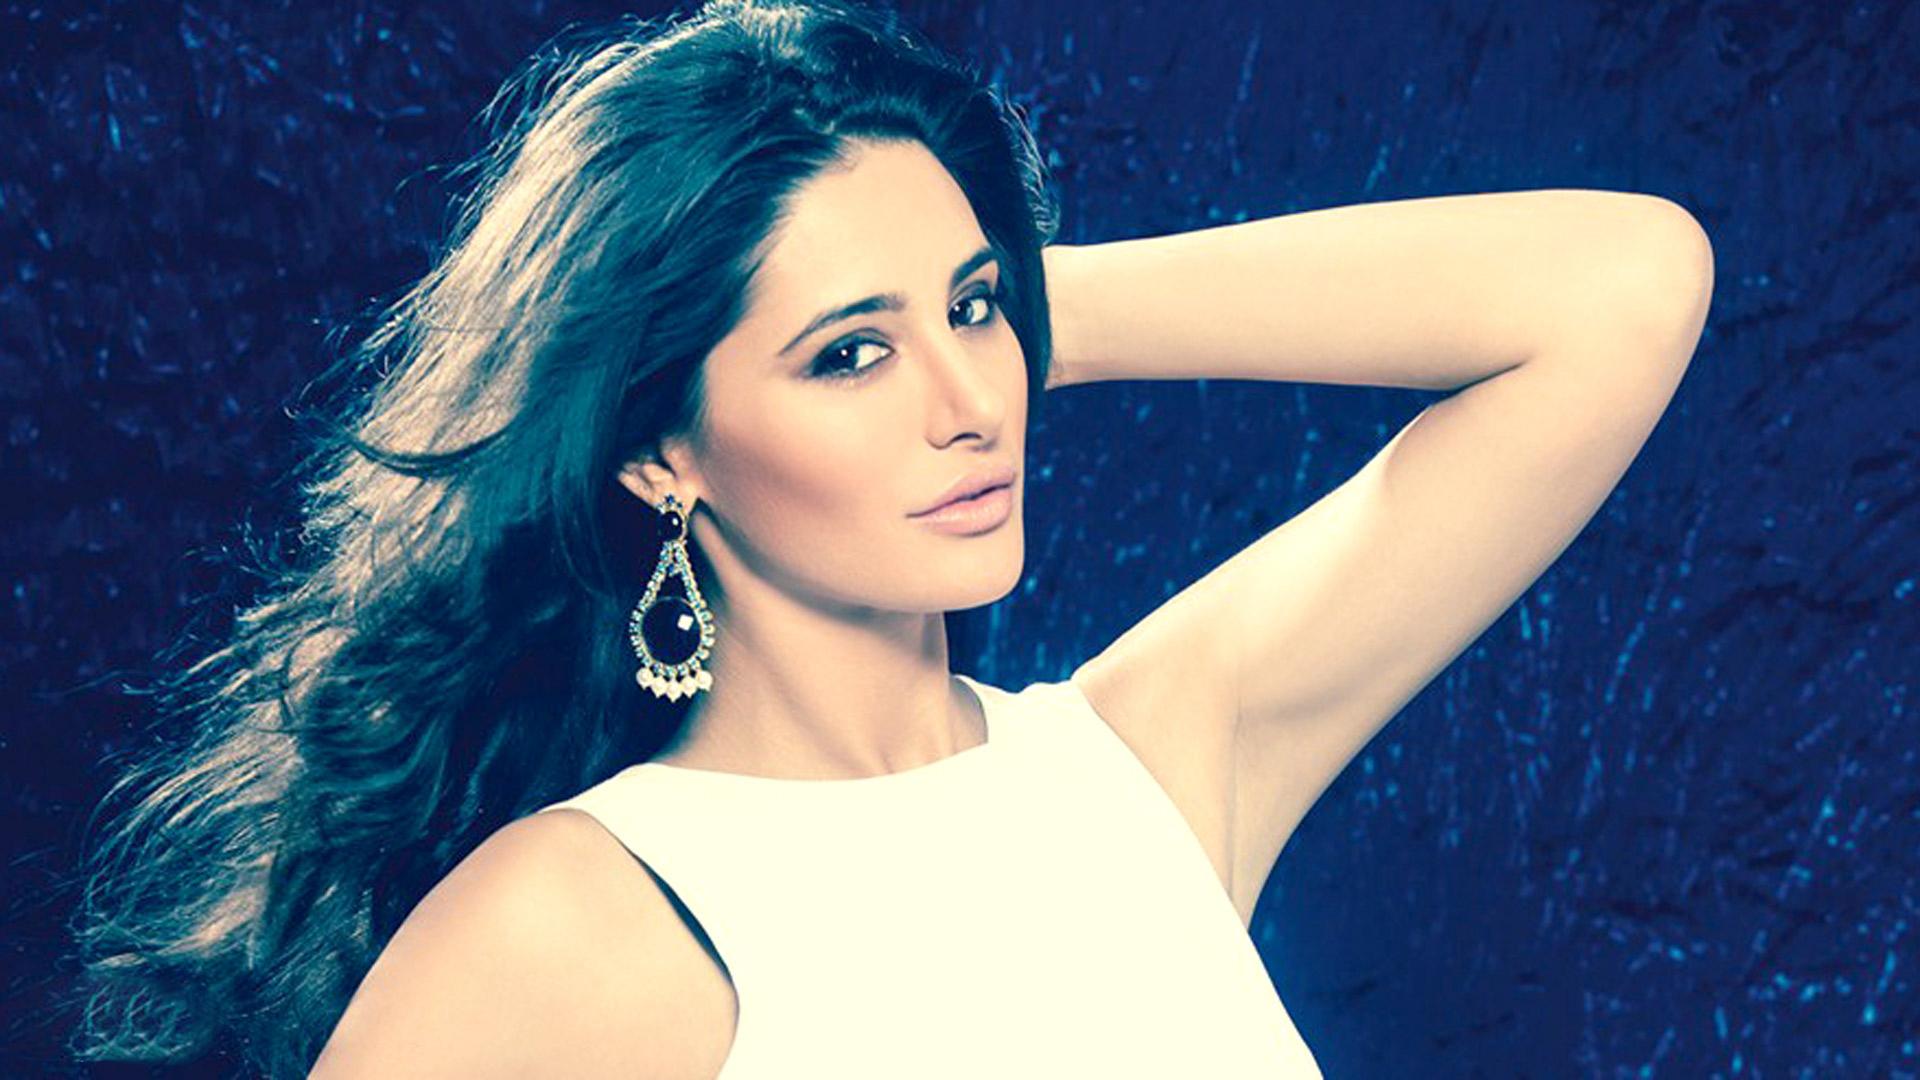 Celebrities Hd Wallpaper Download Nargis Fakhri Hd